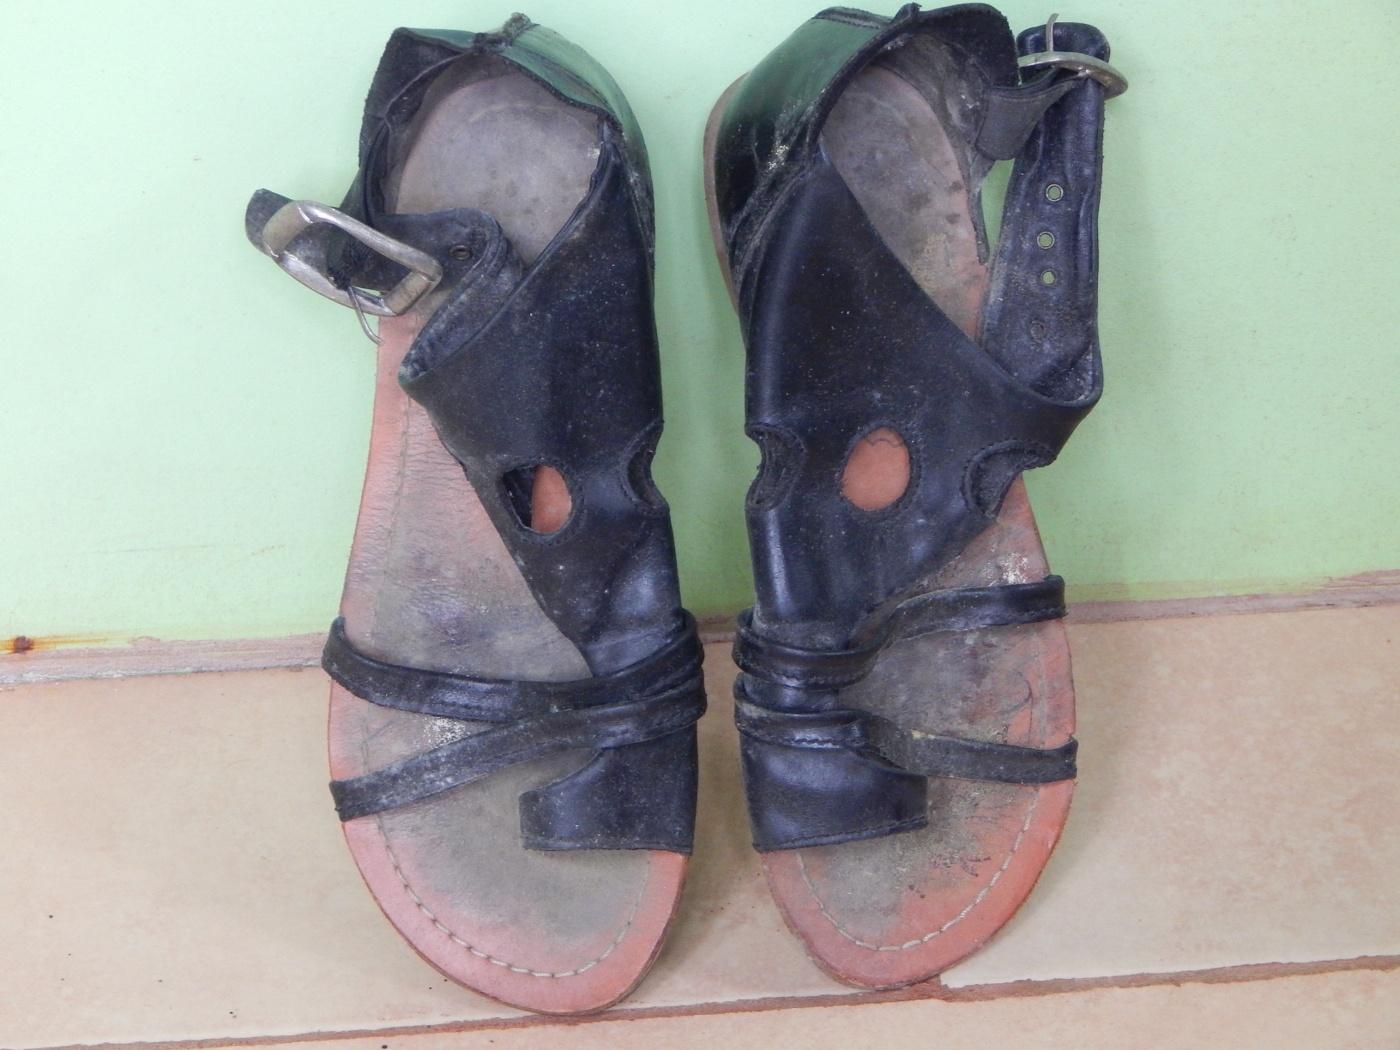 Schuhe im Paradies